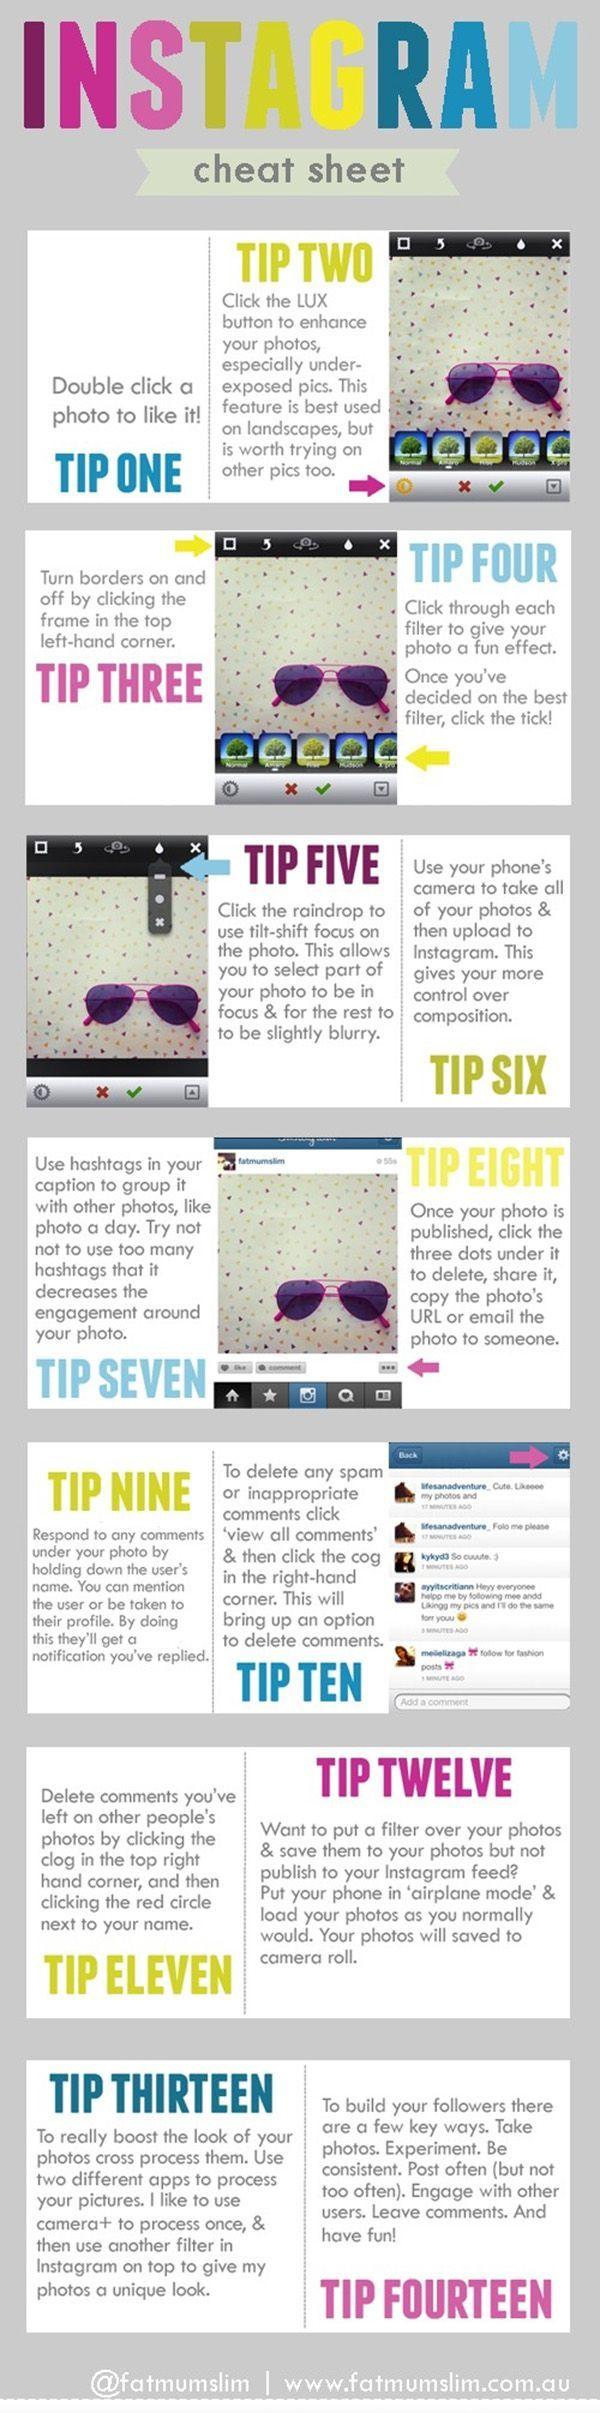 #Instagram cheat sheet to make your Social Media marketing easier #Infographics www.socialmediamamma.com